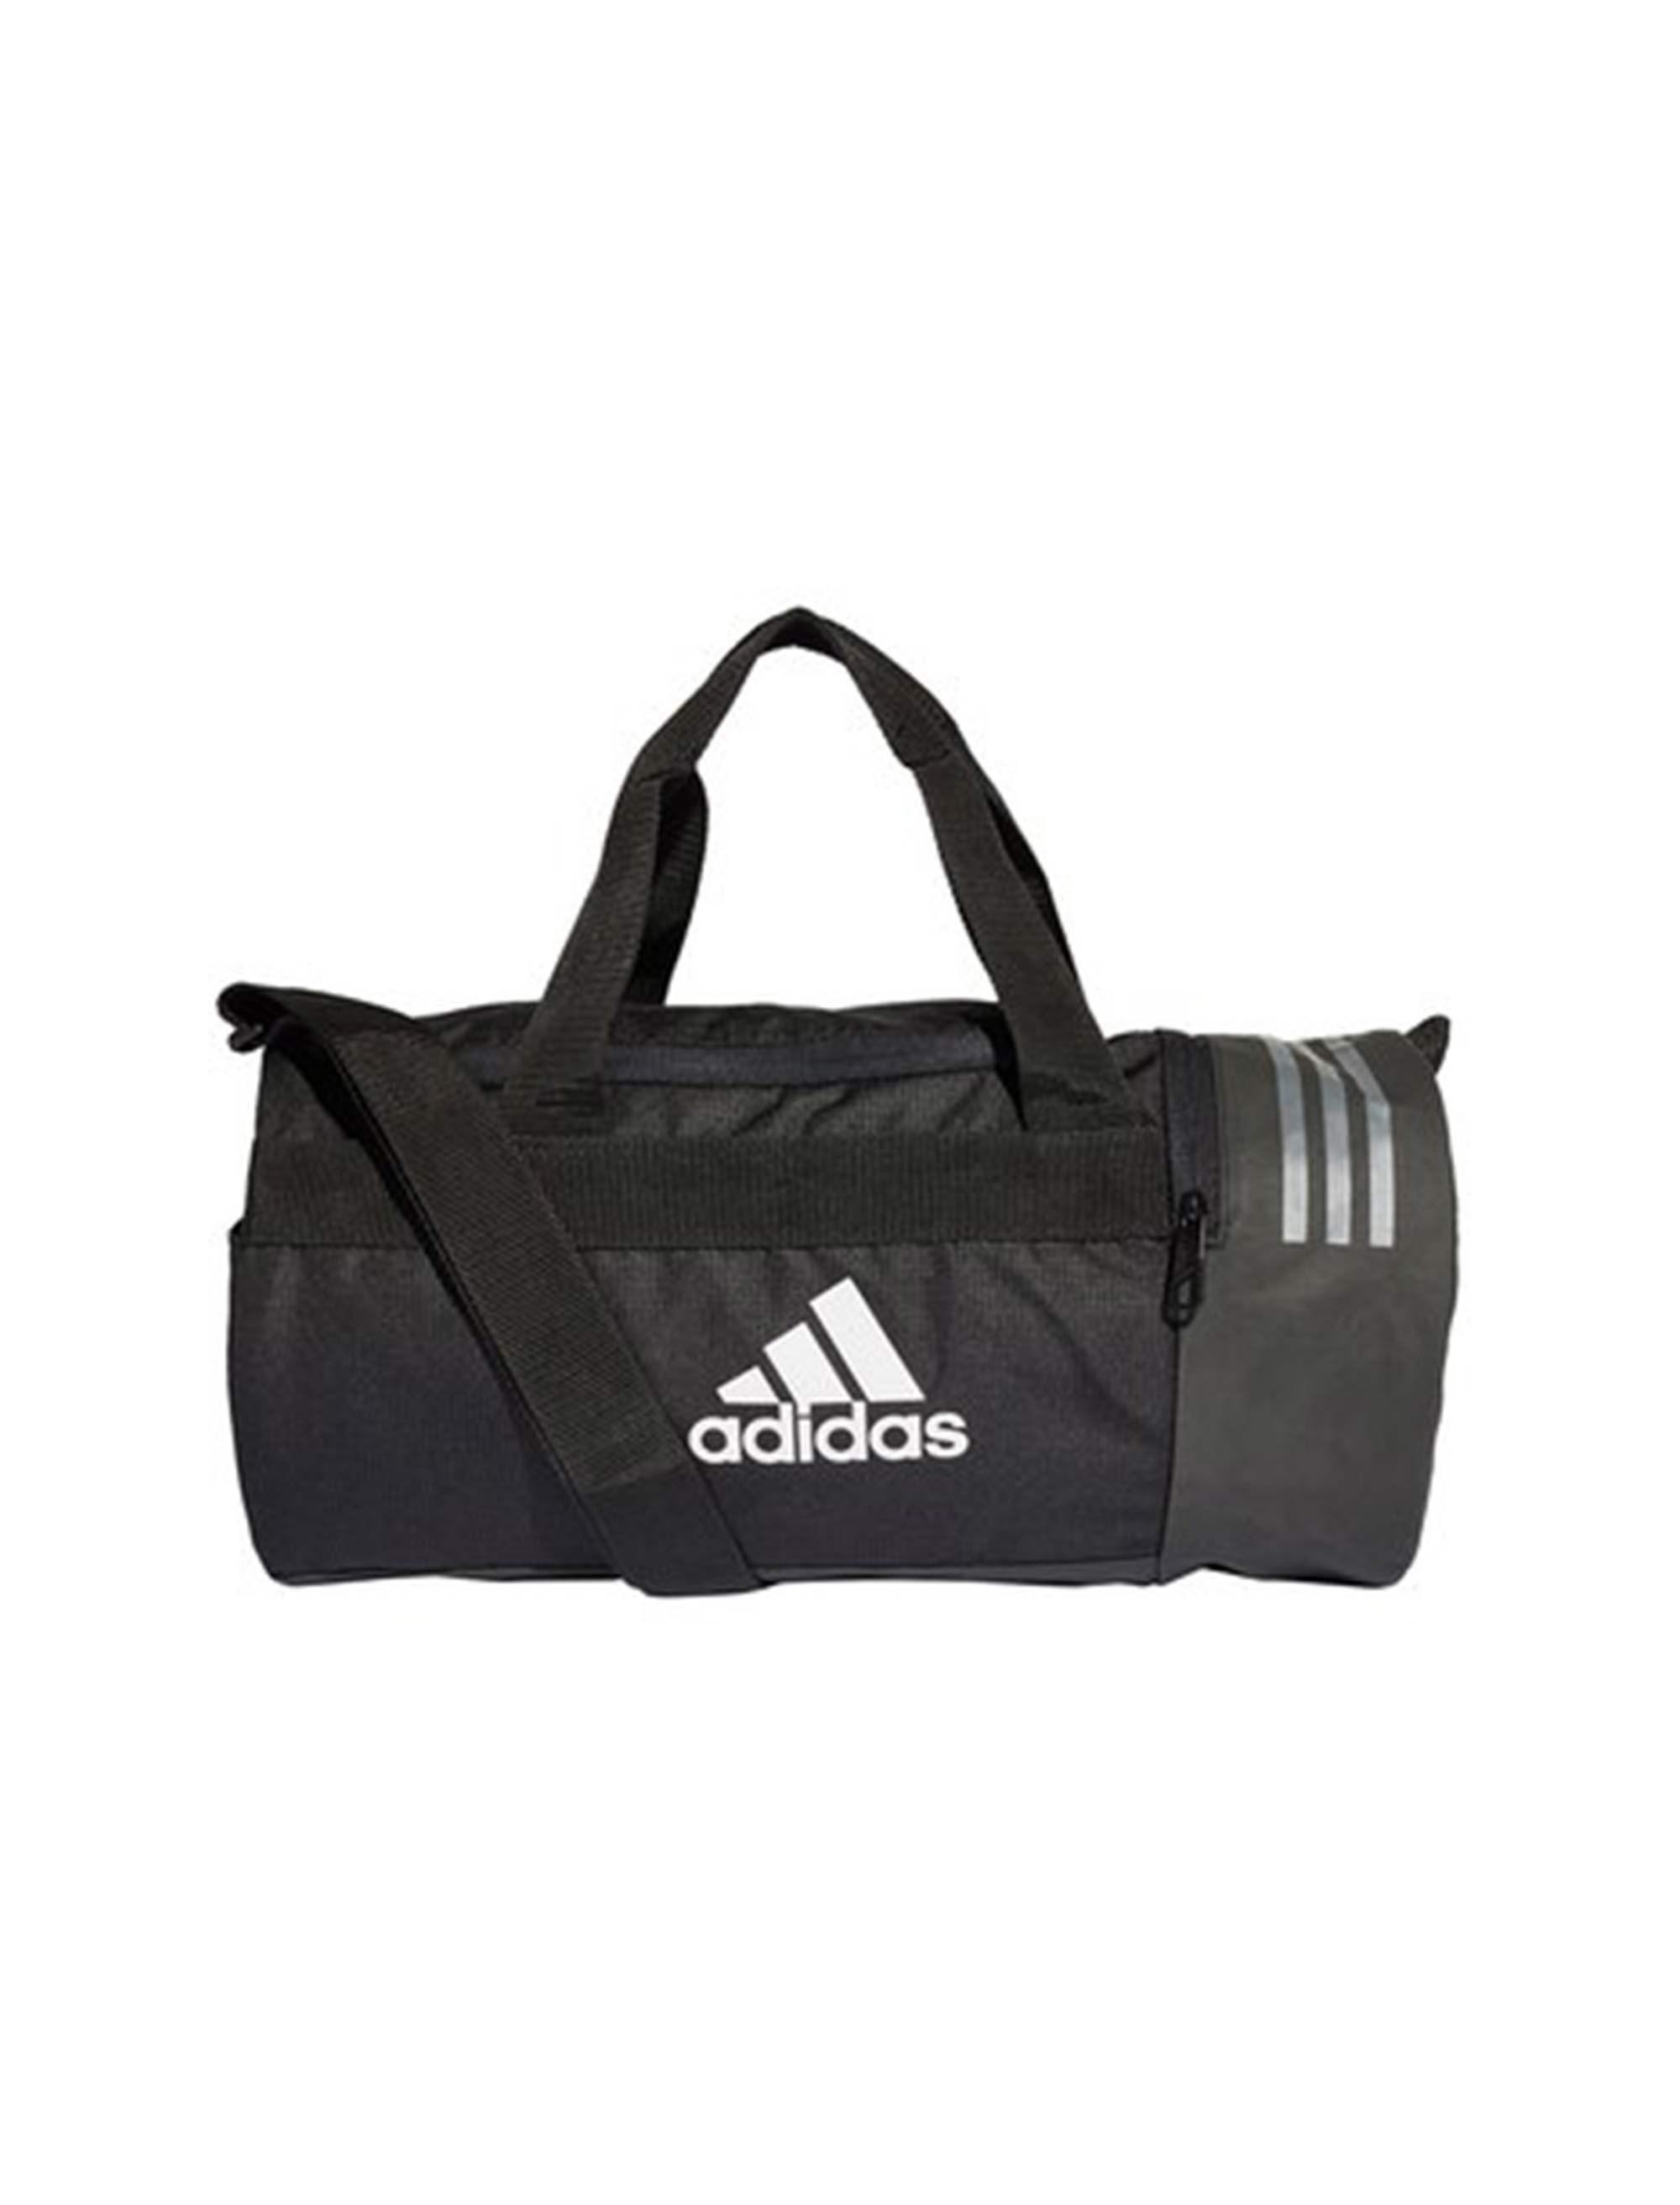 ساک ورزشی بزرگسال Stripes Duffel Bag XS - آدیداس سایز XS